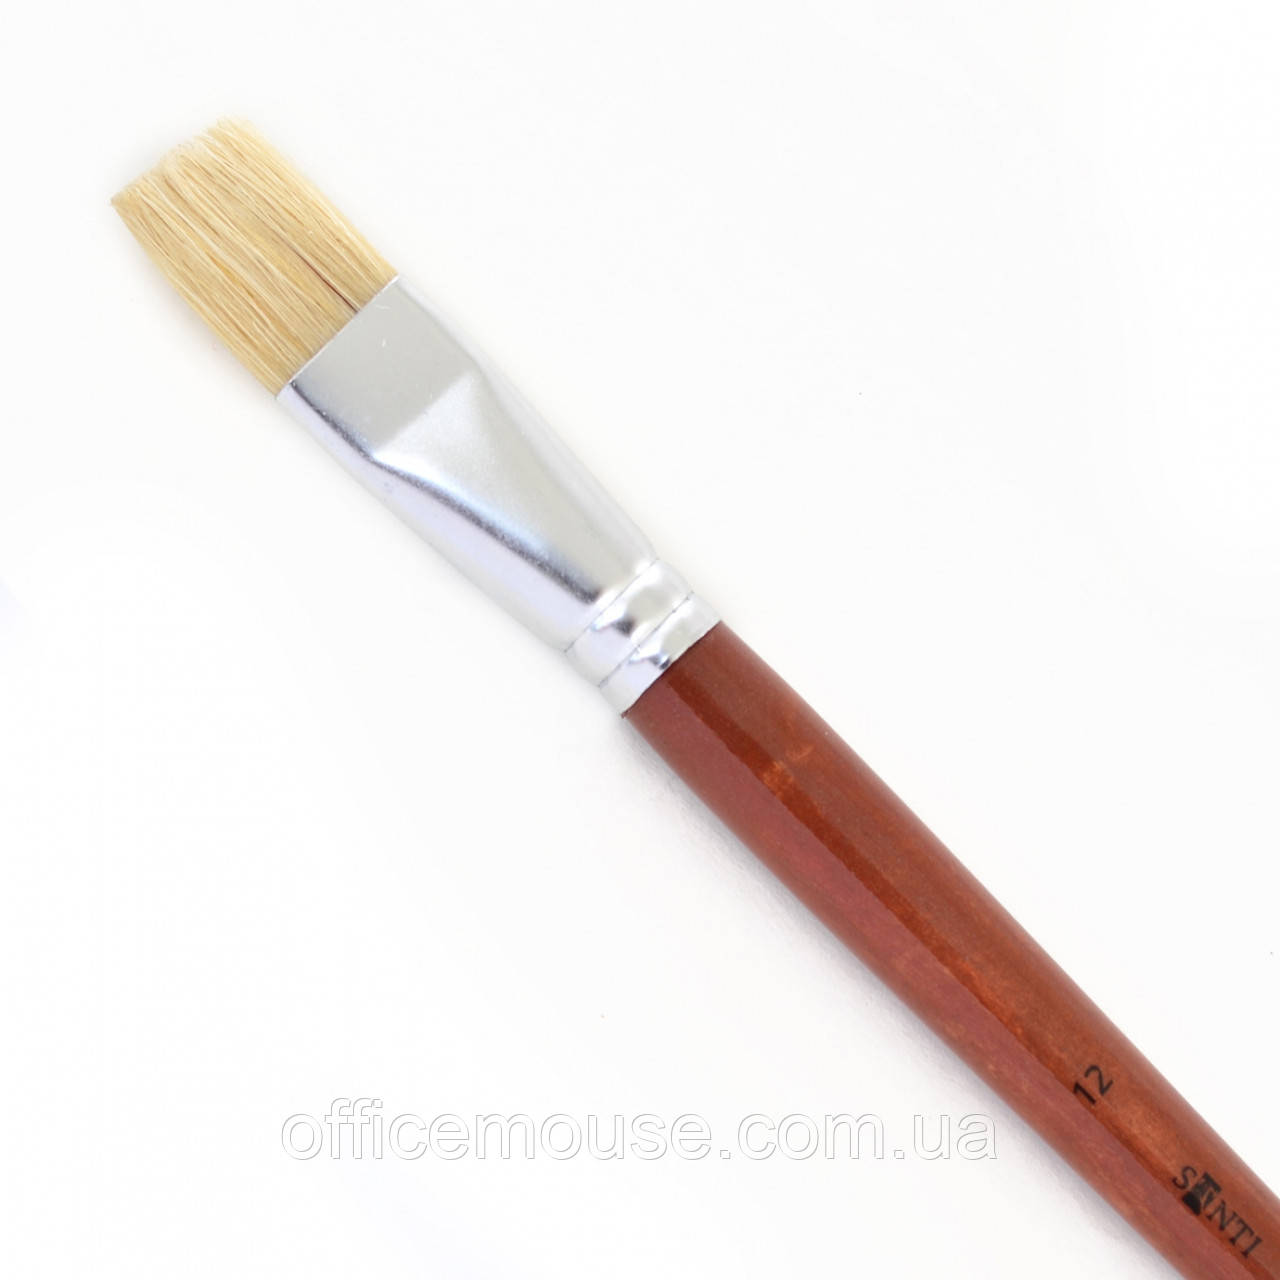 "Пензлик худож. щетина ""Santi Studio"", довга ручка, плоска, №12."